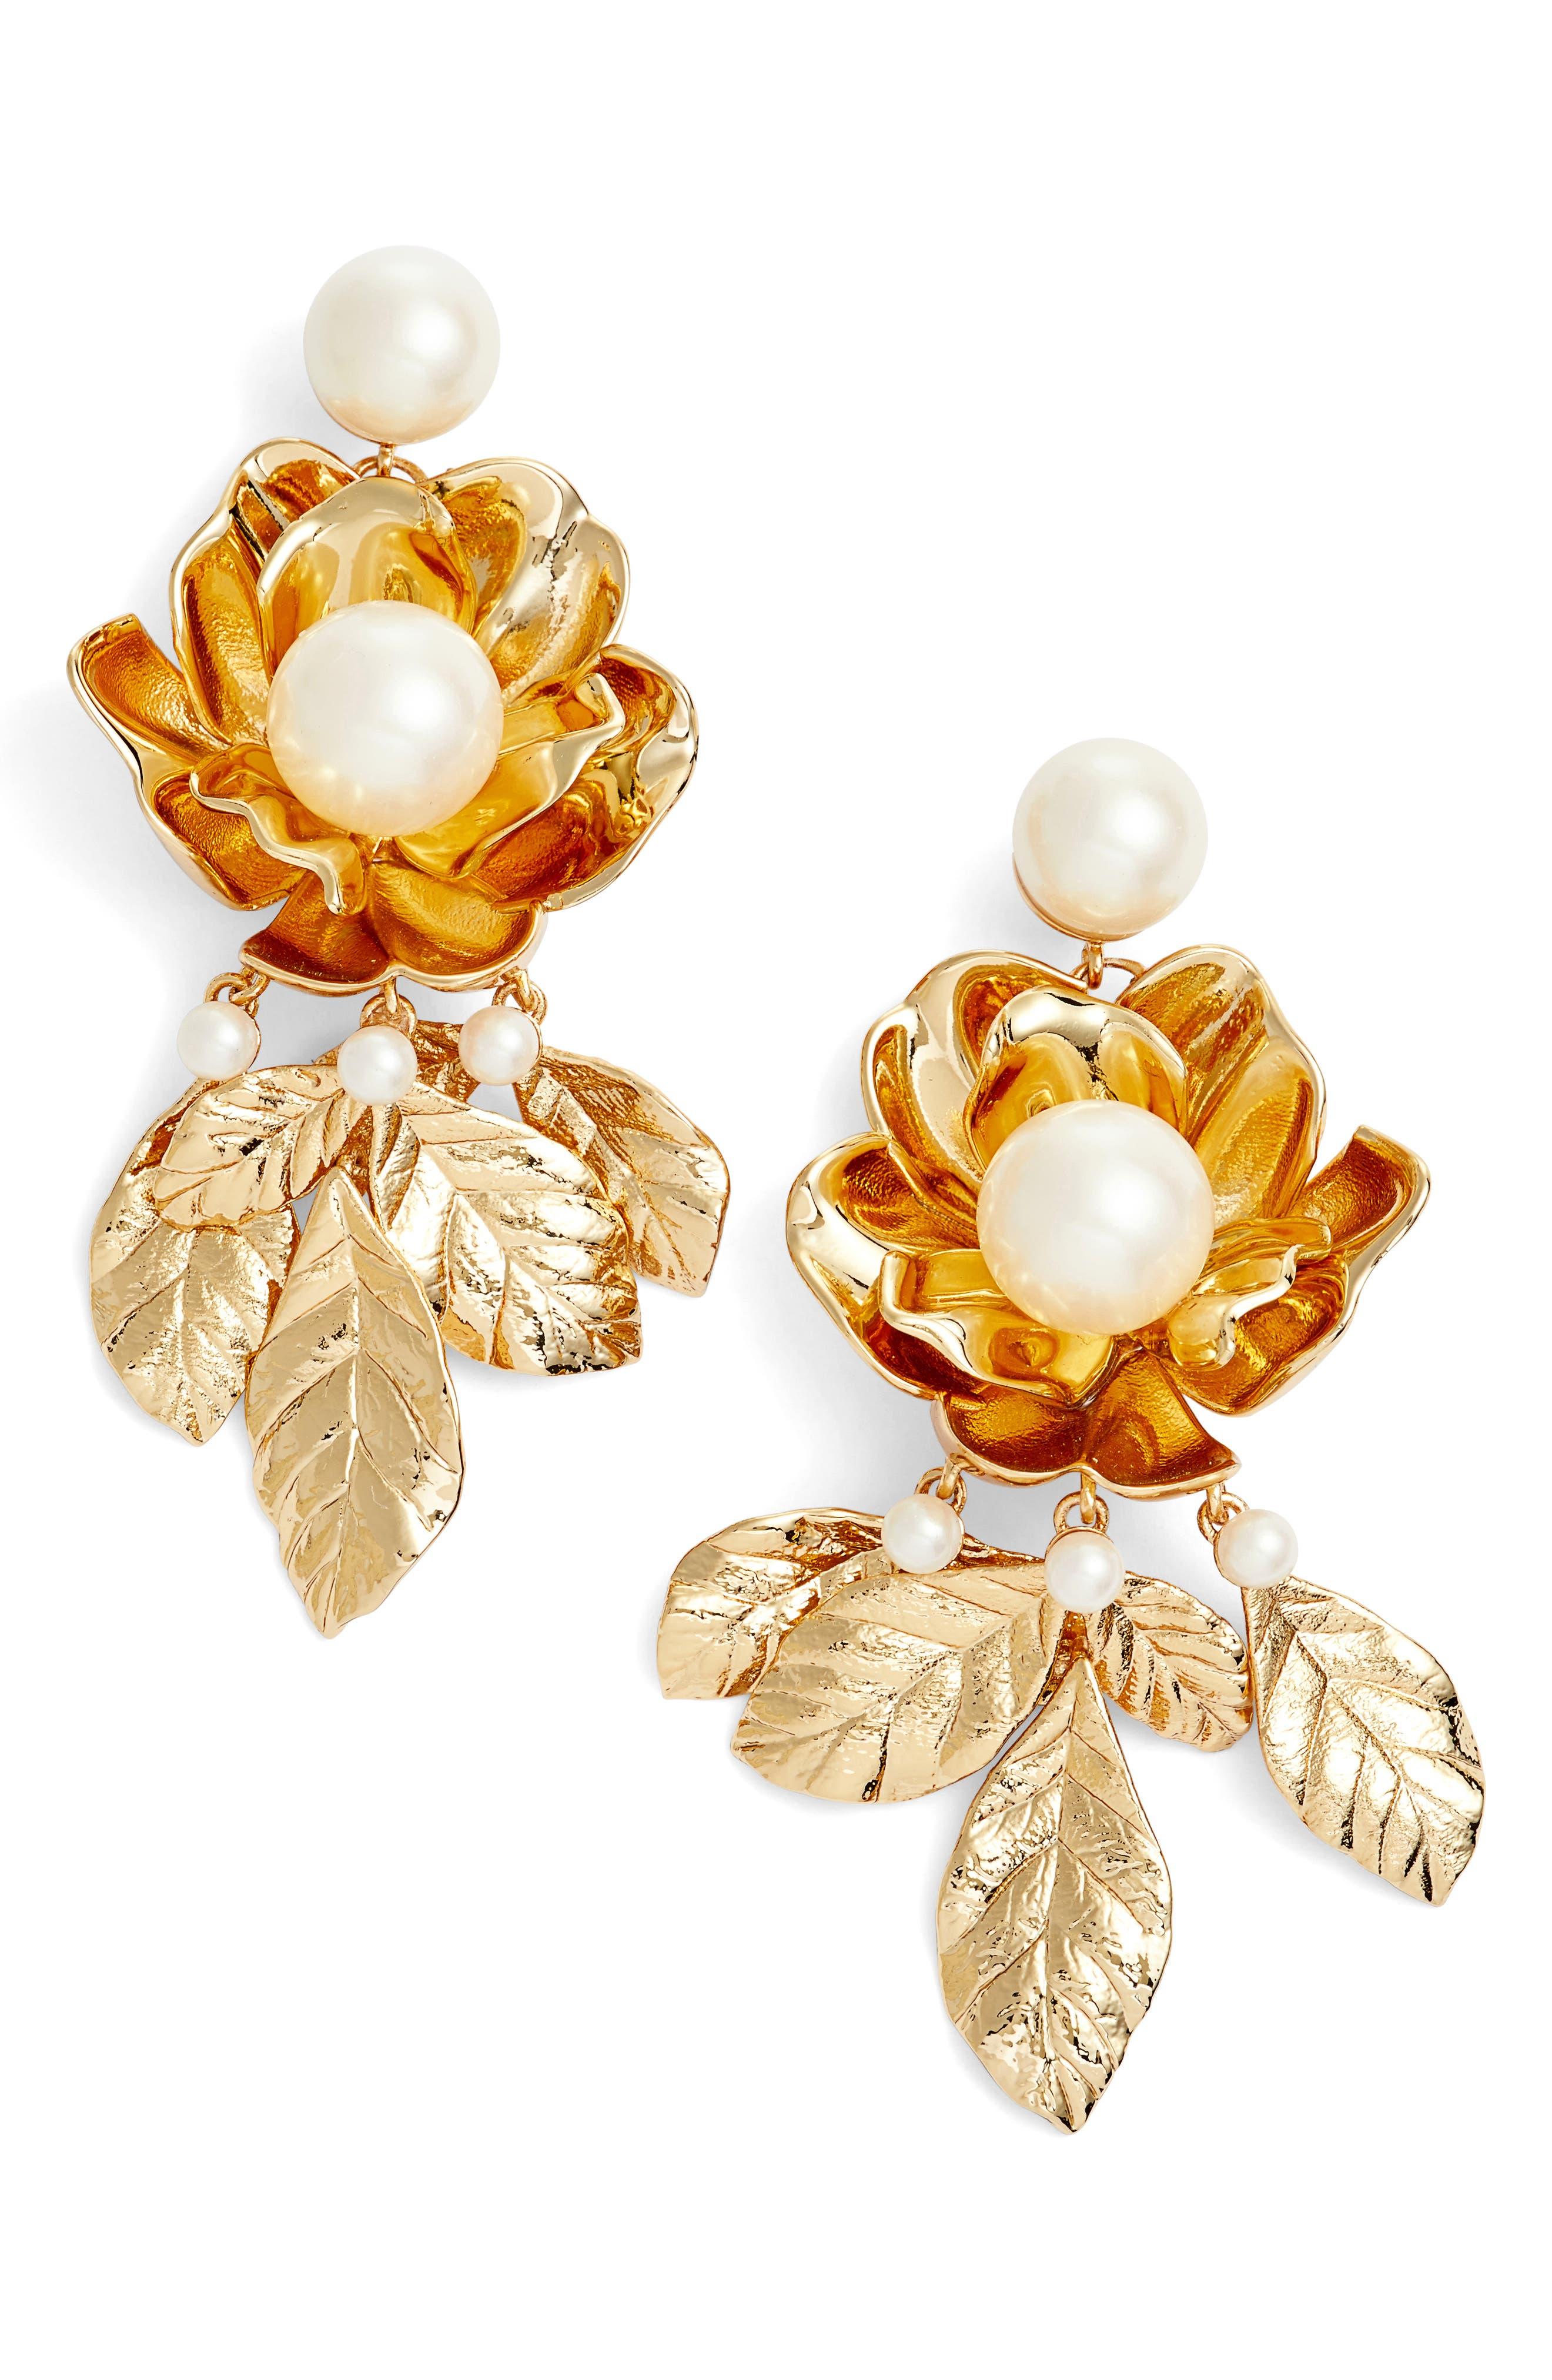 KATE SPADE NEW YORK kate spade imitation pearl flower earrings, Main, color, 711